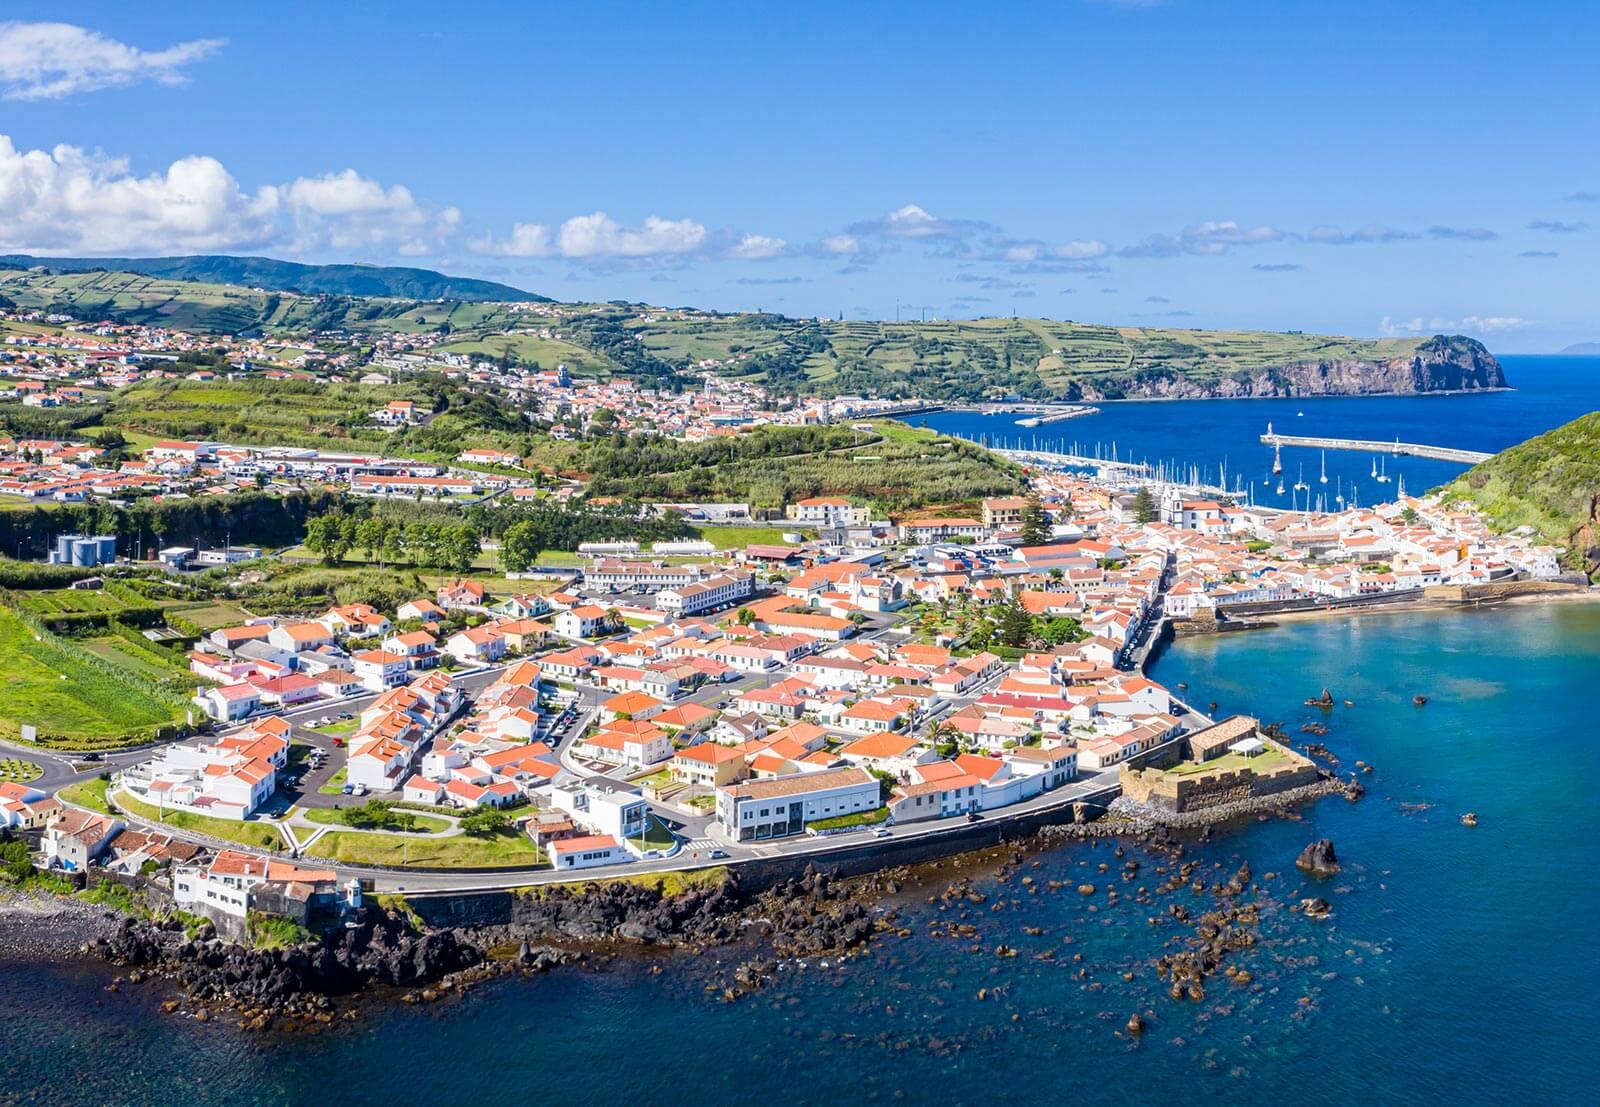 Horta bay, on the island of Faial